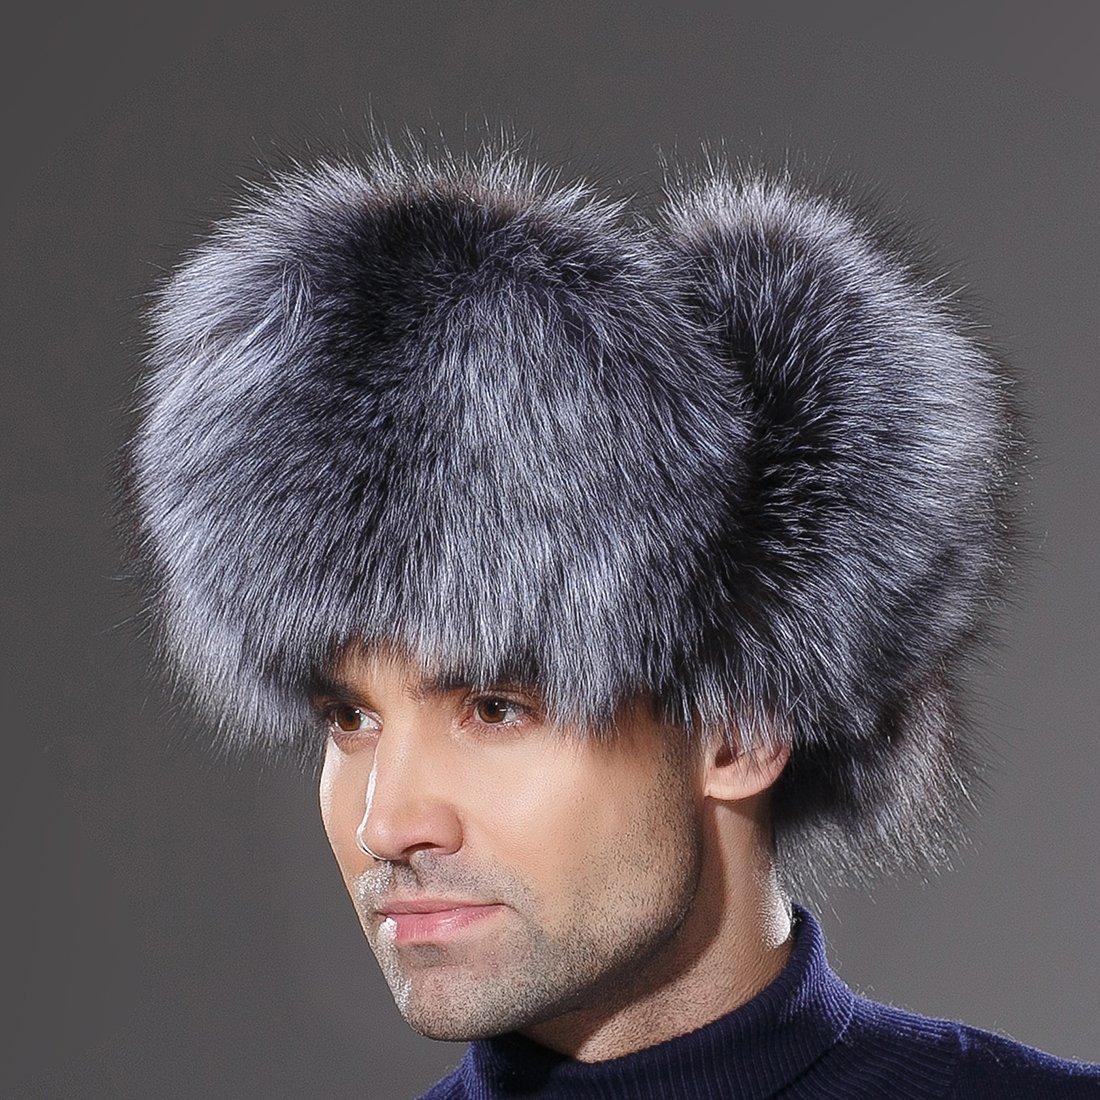 URSFUR Winter Mens Russian Ushanka Hat Real Leather & Silver Fox Fur Trapper Cap by URSFUR (Image #7)